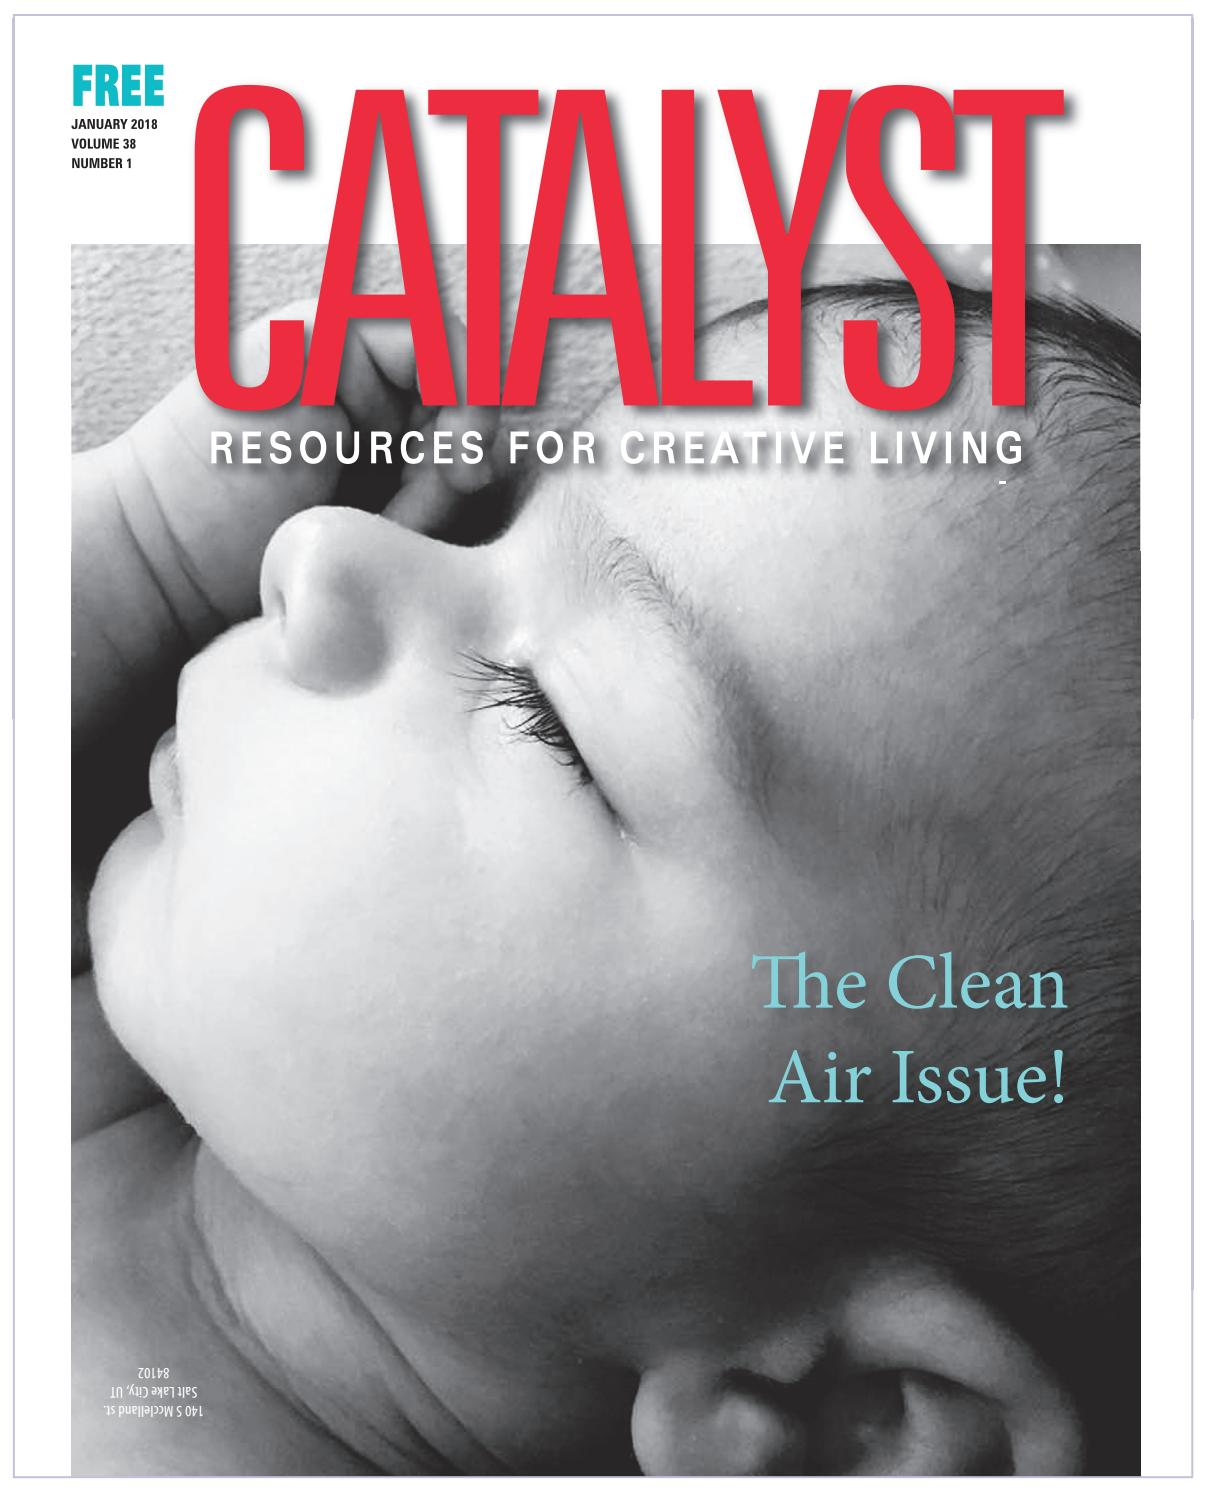 80135aa224 CATALYST January 2018 by CATALYST Magazine - issuu